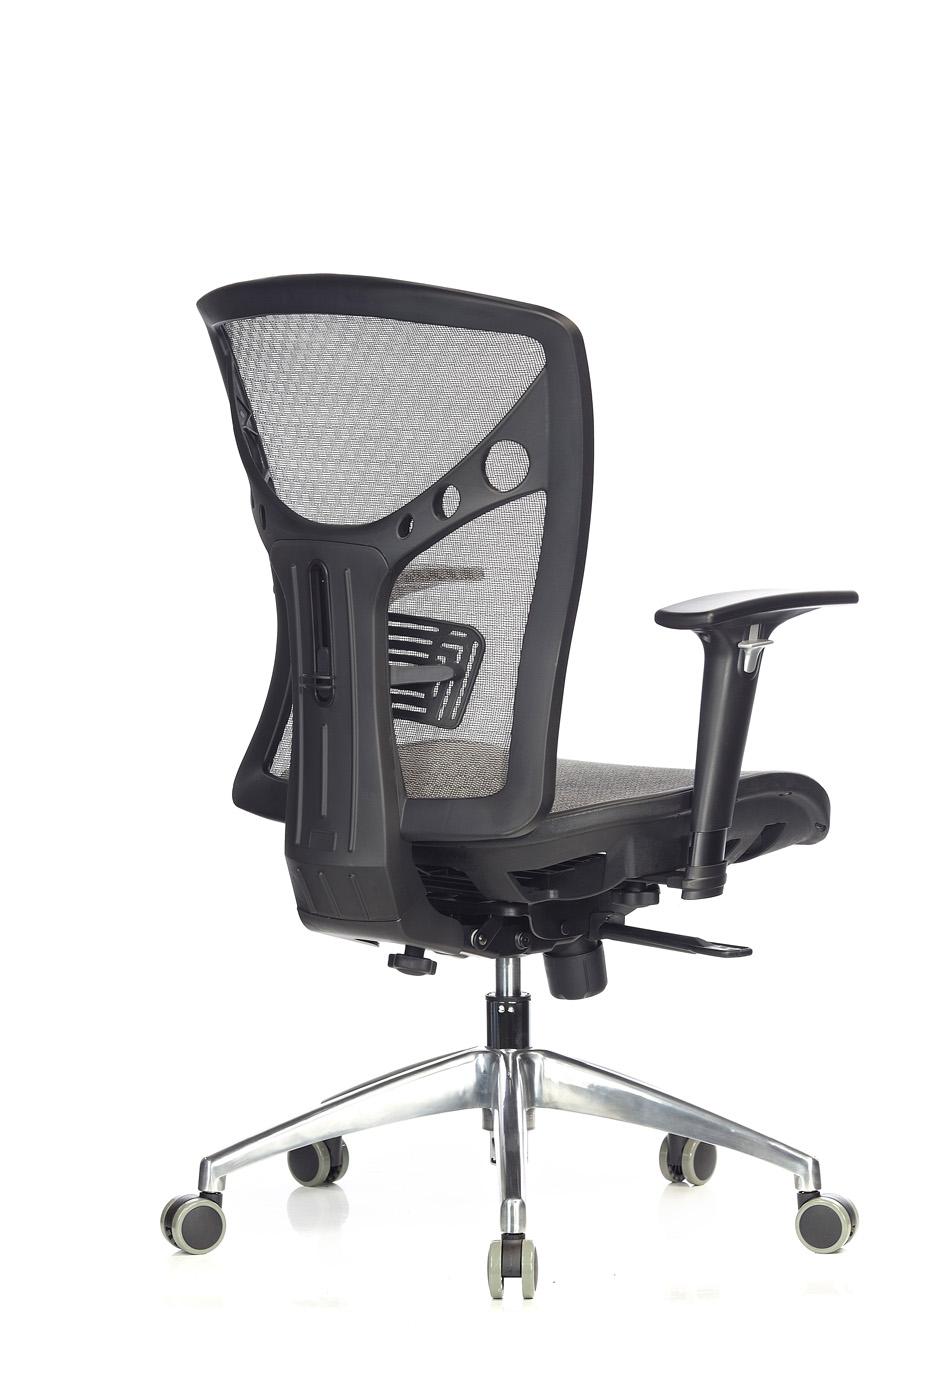 Y-40MA office chair